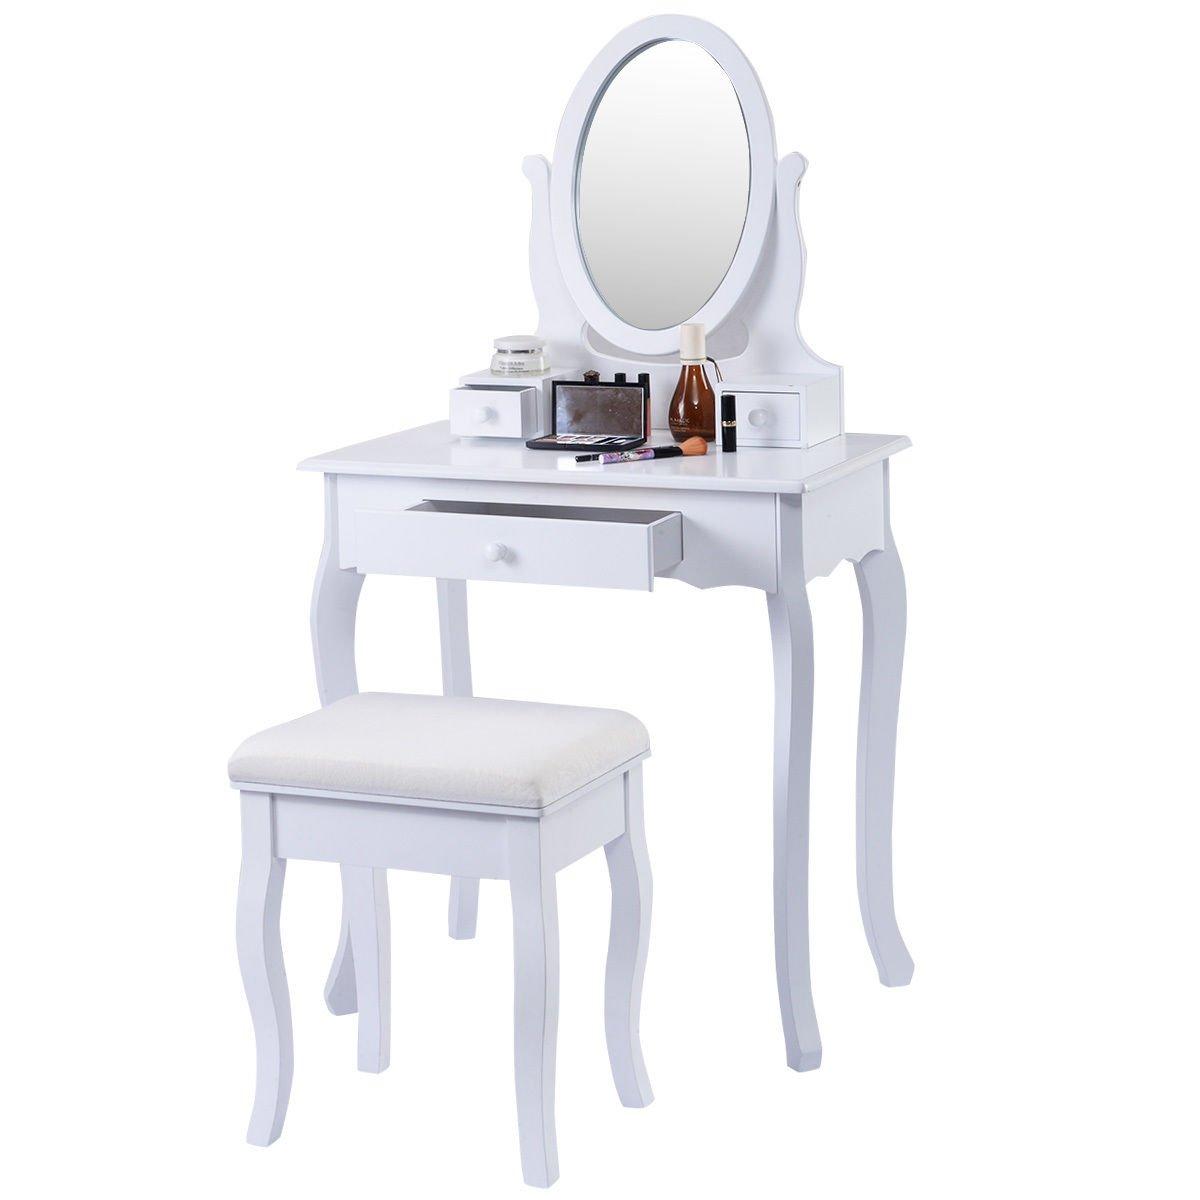 Giantex White Vanity Table Jewelry Makeup Desk Bench Dresser w/ Stool 3 Drawers